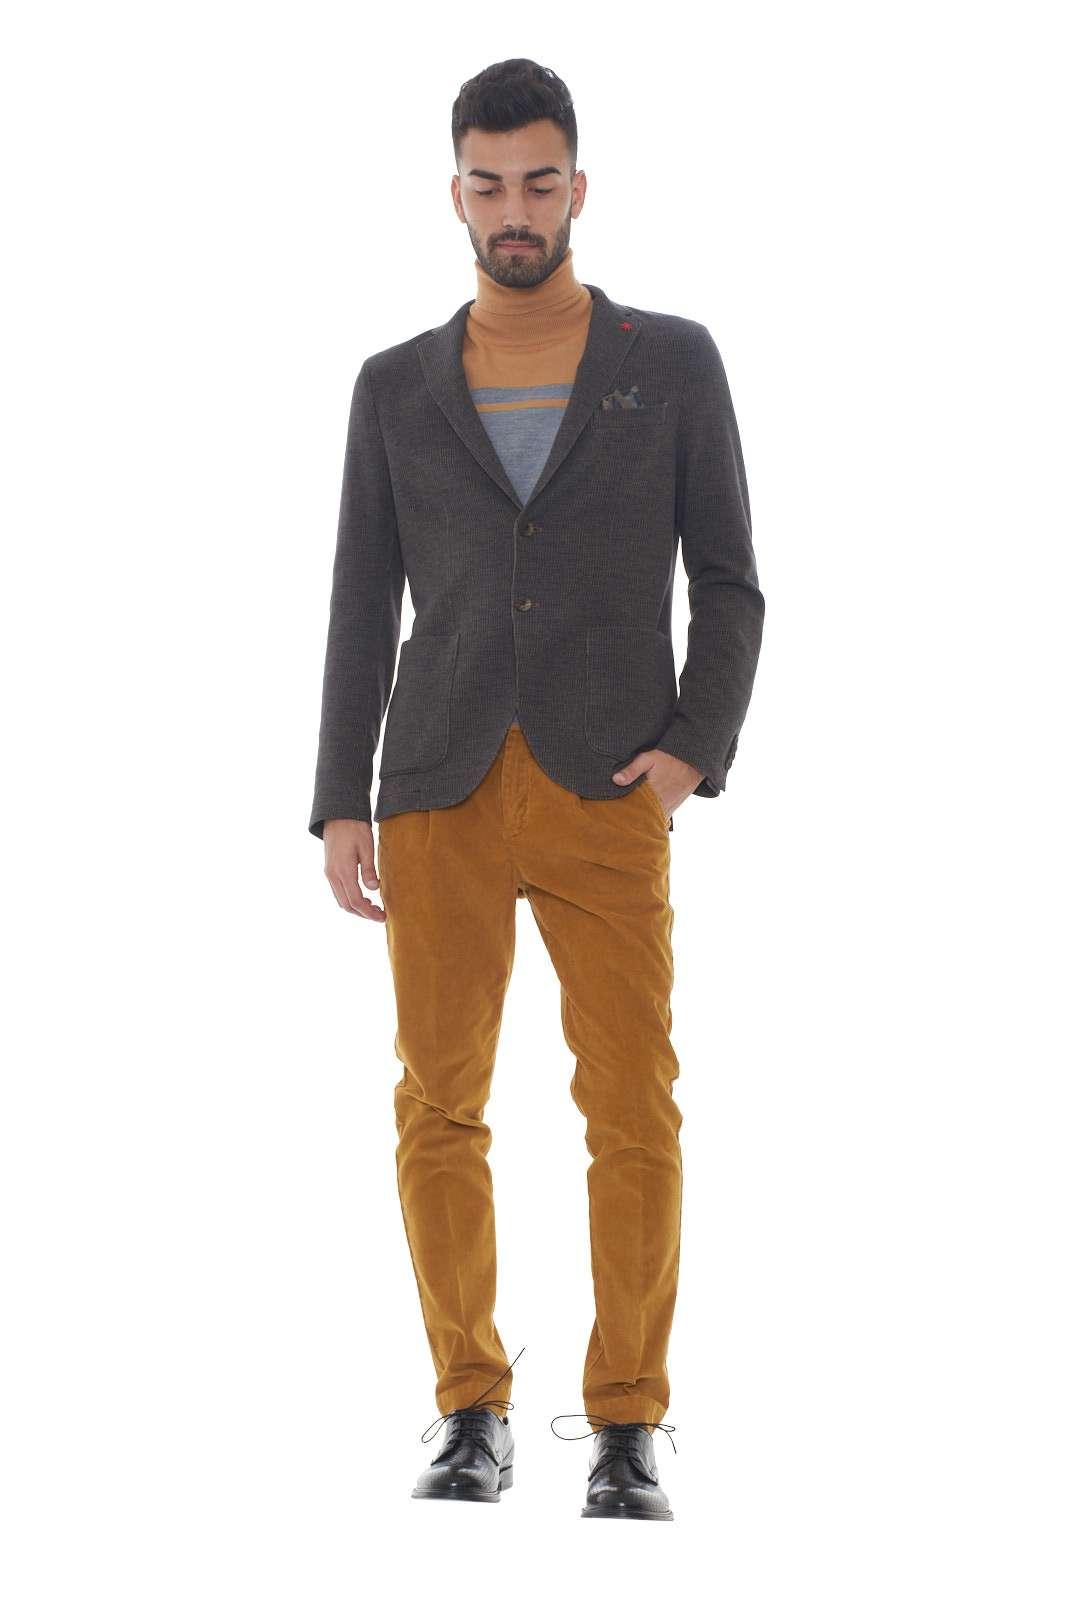 https://www.parmax.com/media/catalog/product/a/i/AI-outlet_parmax-giacca-uomo-Manuel-Ritz-2732G2442T%20193515-D.jpg